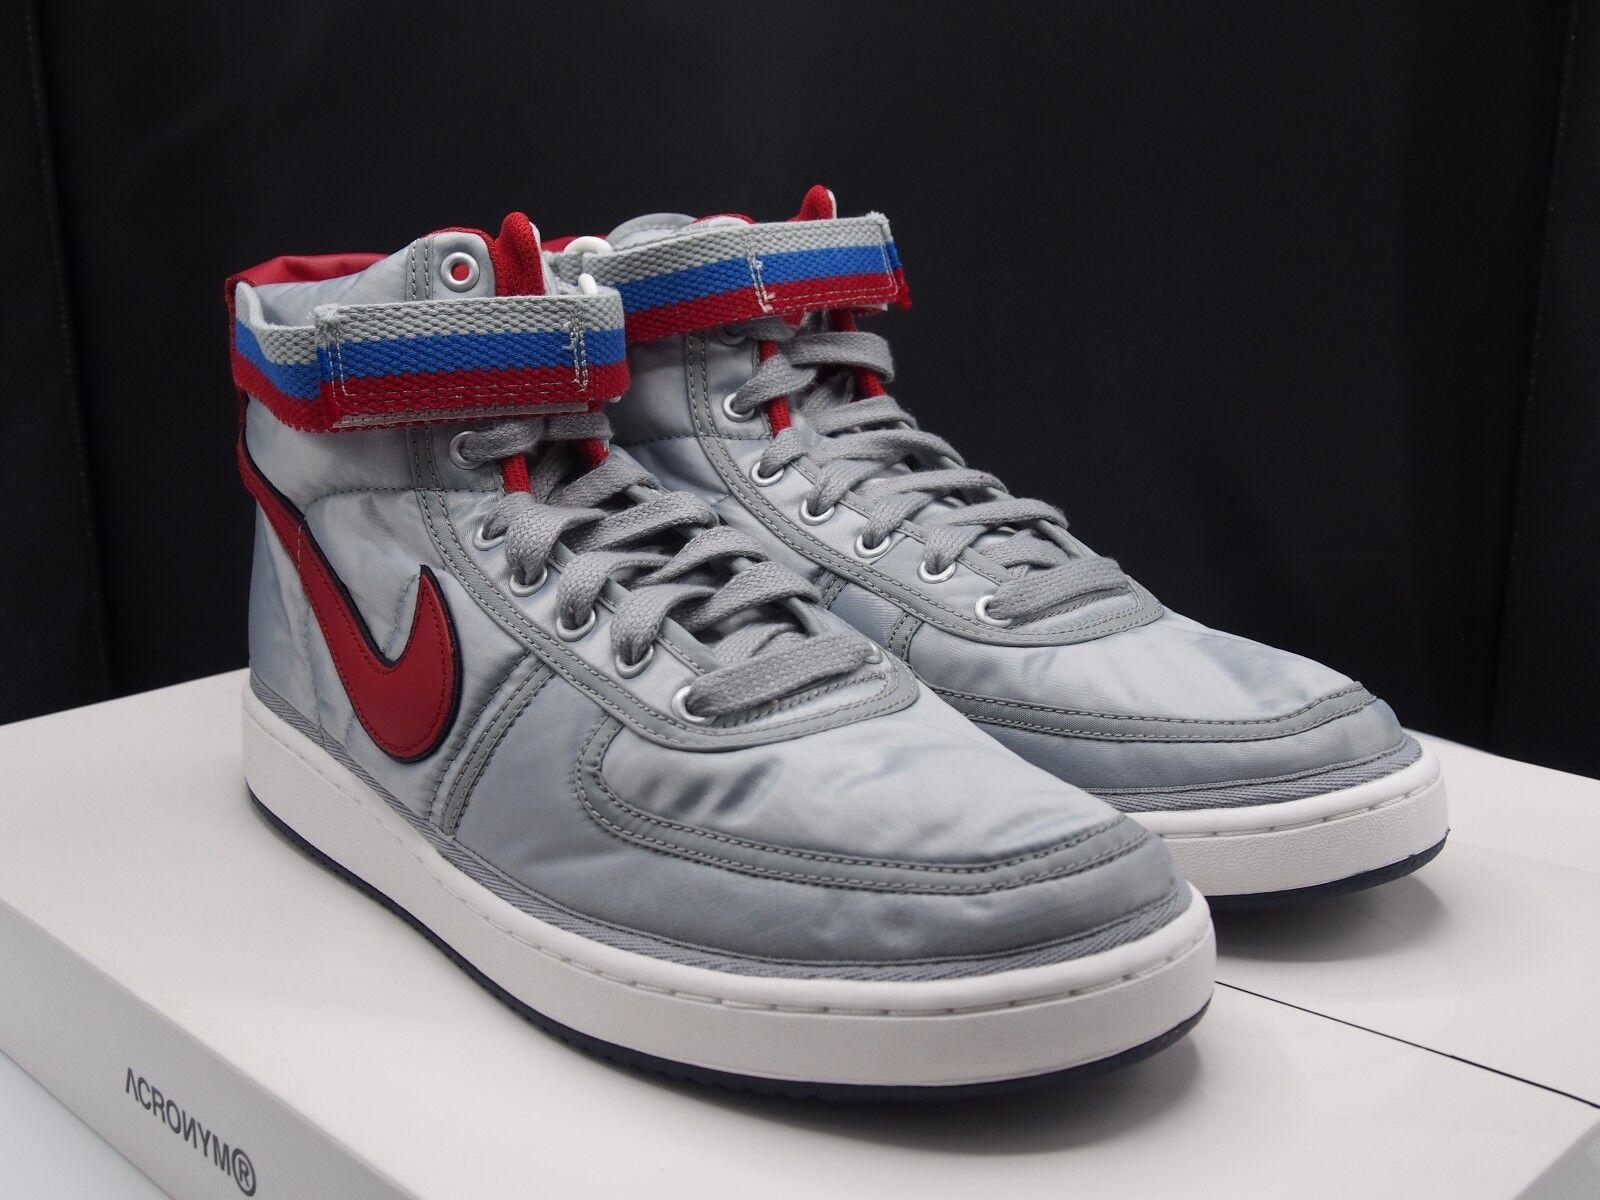 Nike Vandal High High Vandal Supreme QS ah8652-001 536566